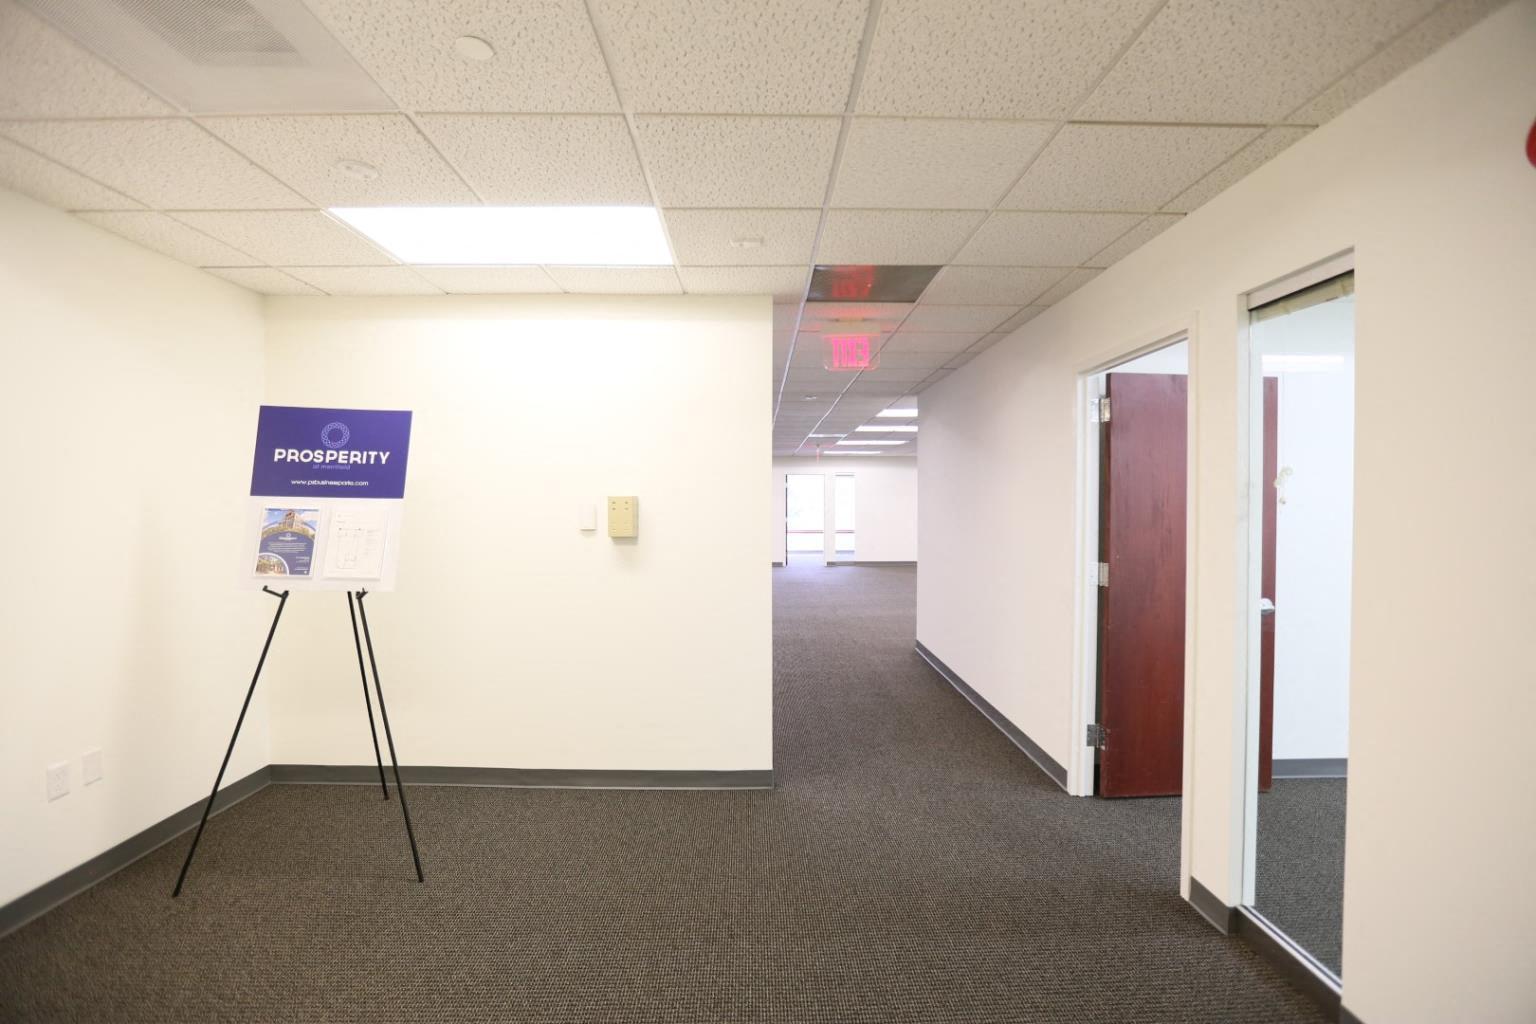 2700 Prosperity Ave, Suite 290